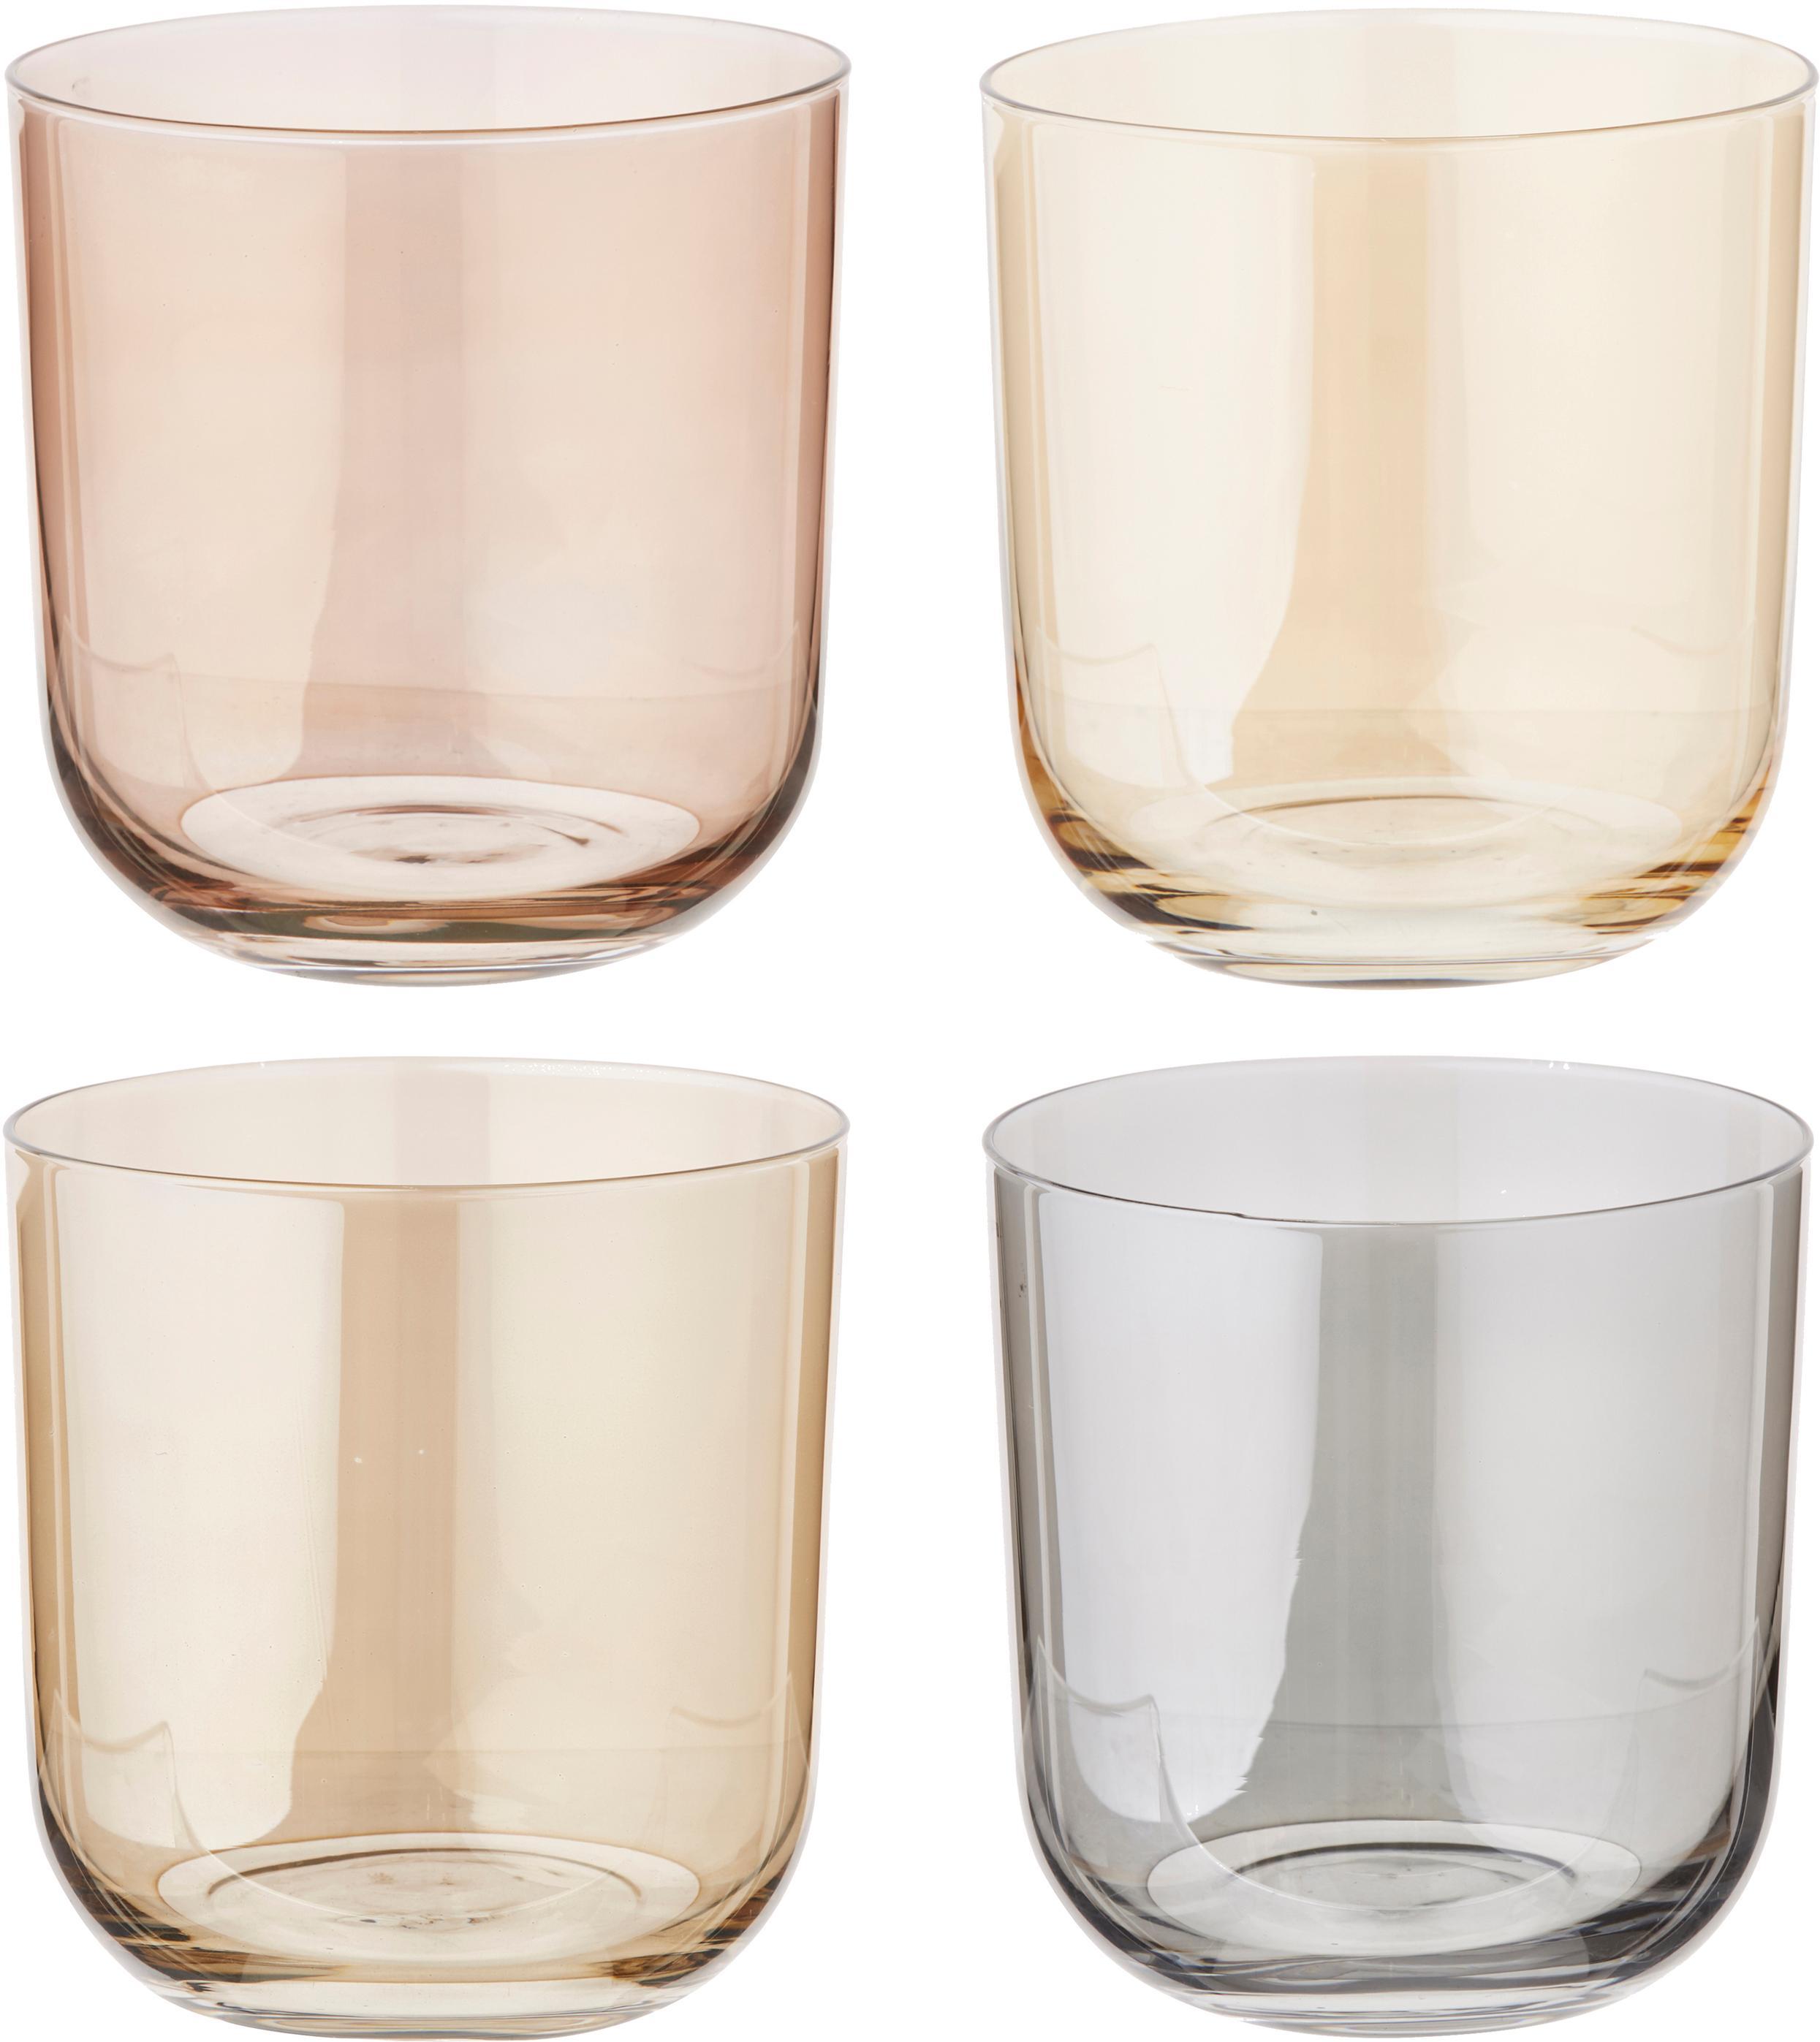 Set 4 bicchieri acqua dipinti a mano Polka, Vetro, Giallo, marrone, grigio, marrone, Ø 9 x Alt. 9 cm